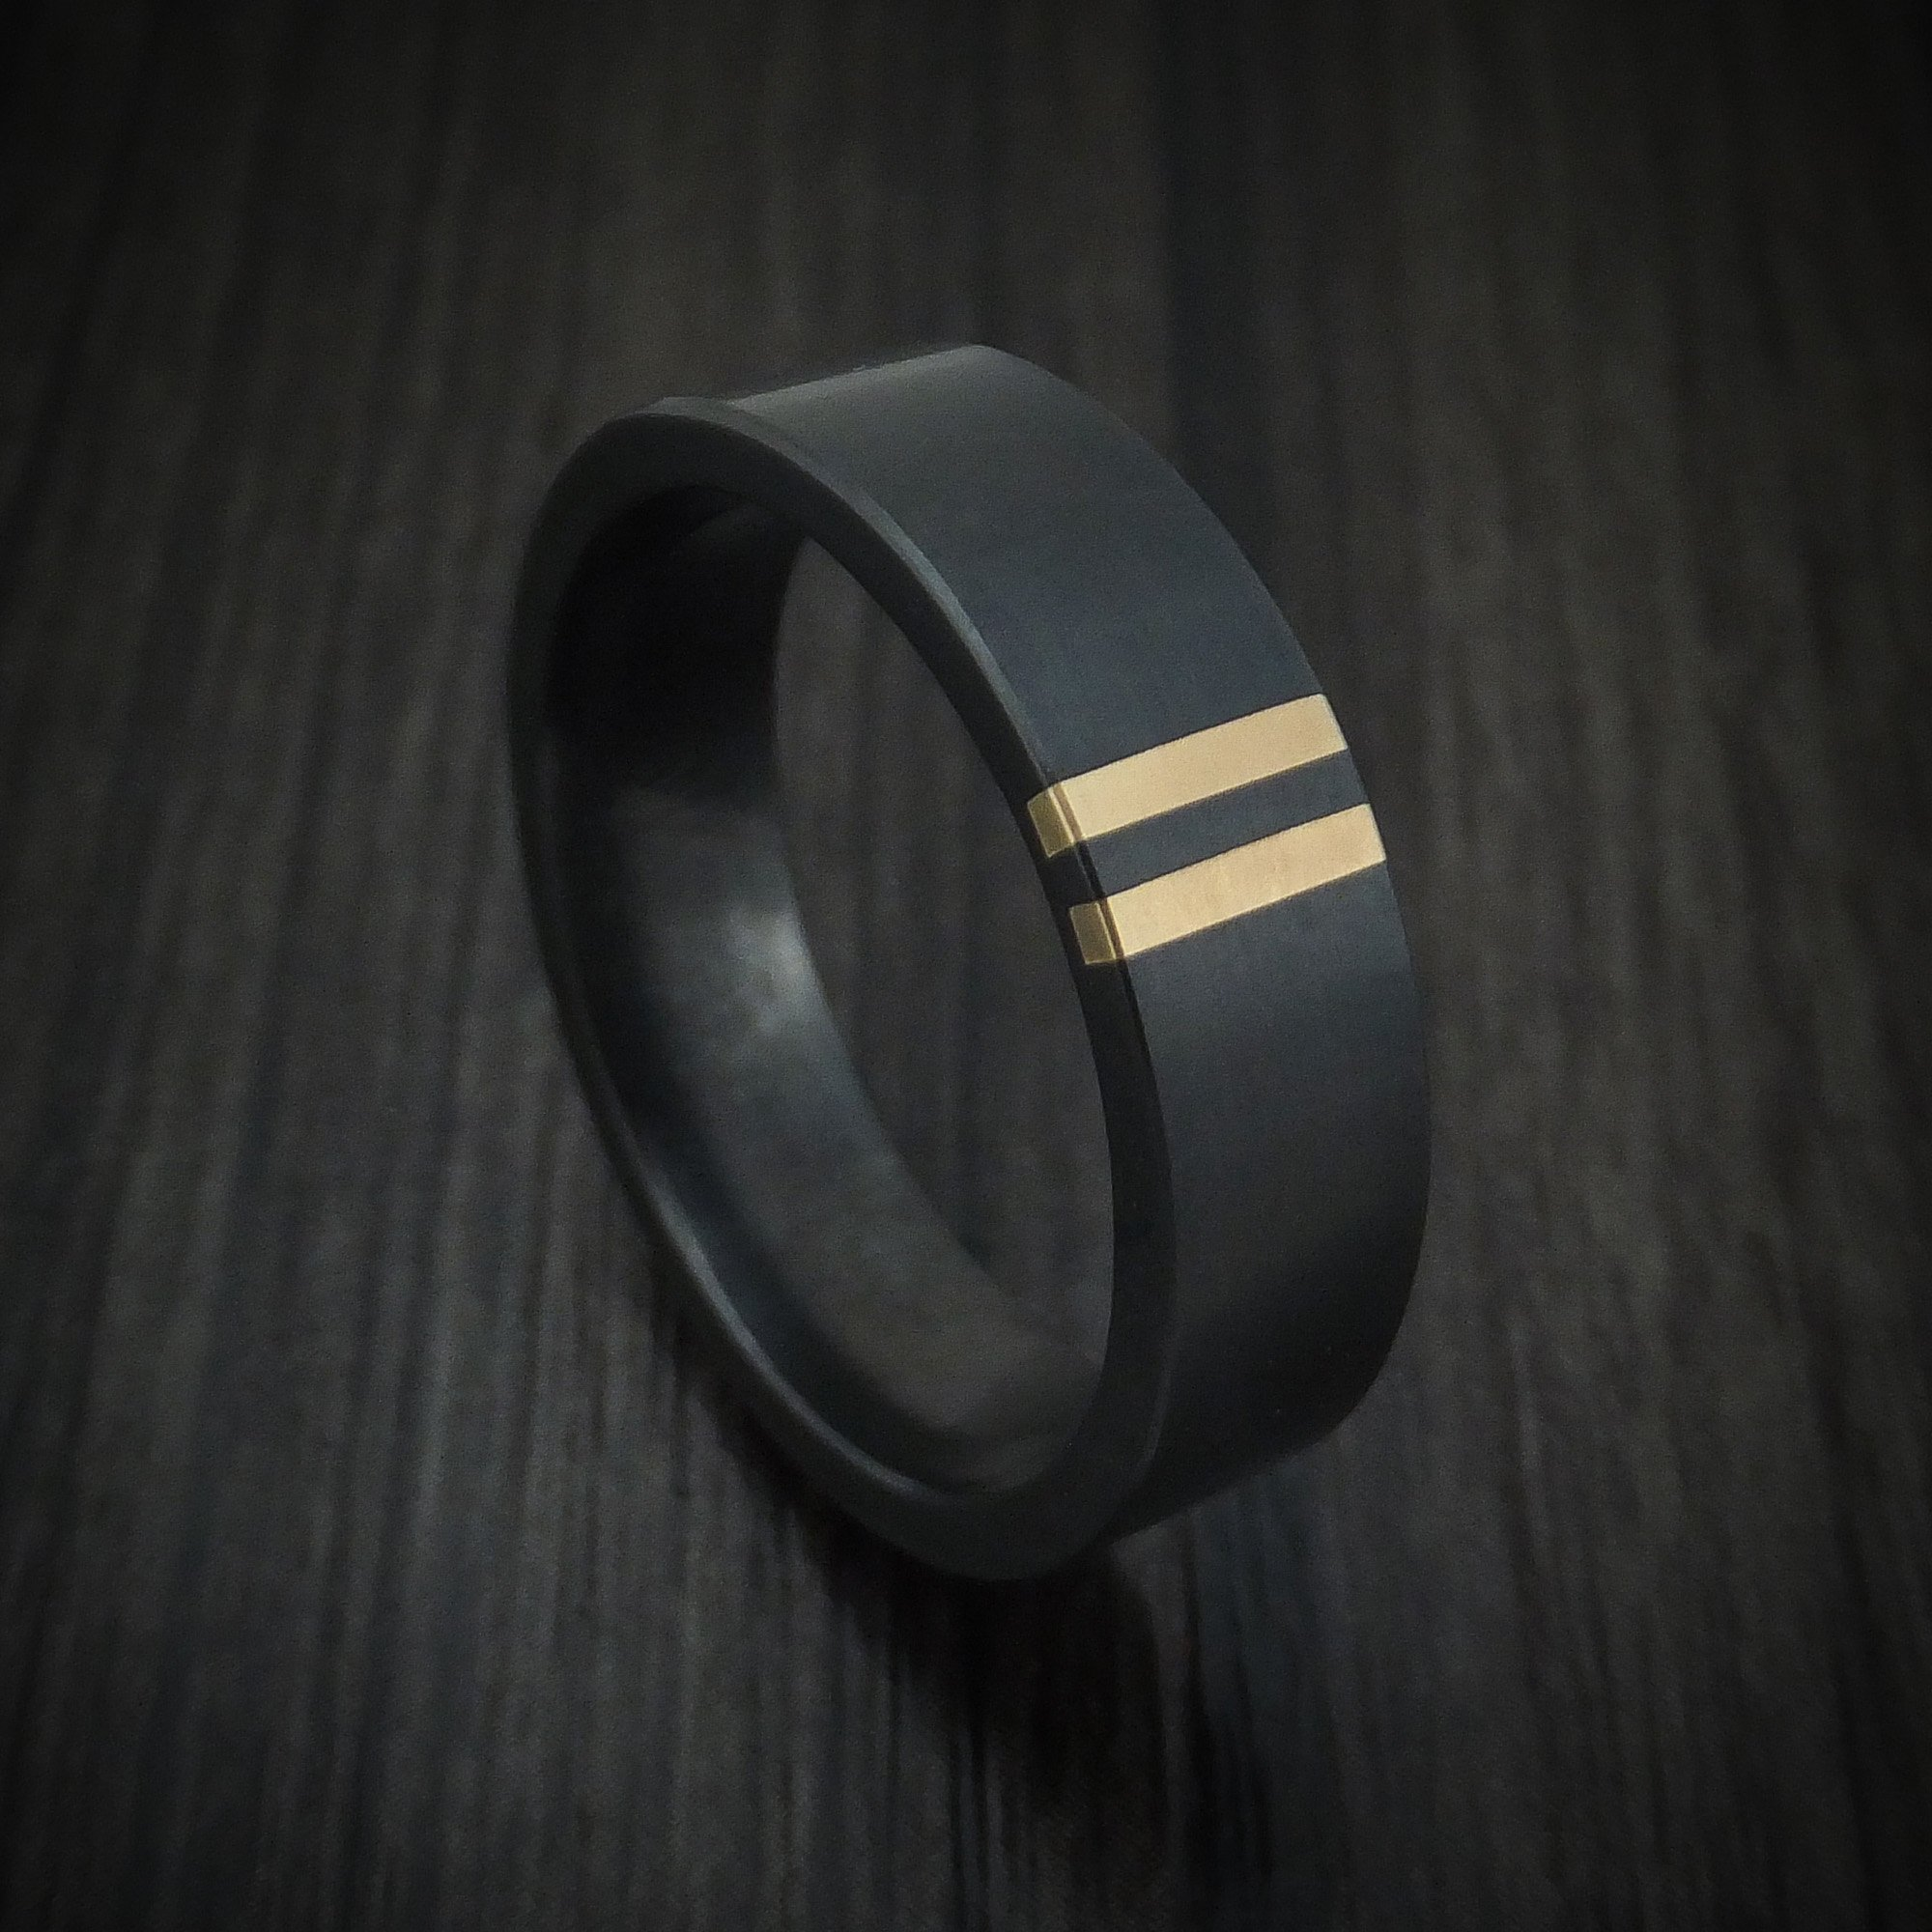 14K Gold Bezel Ring 2mm ~ Size LUS 6EU 53